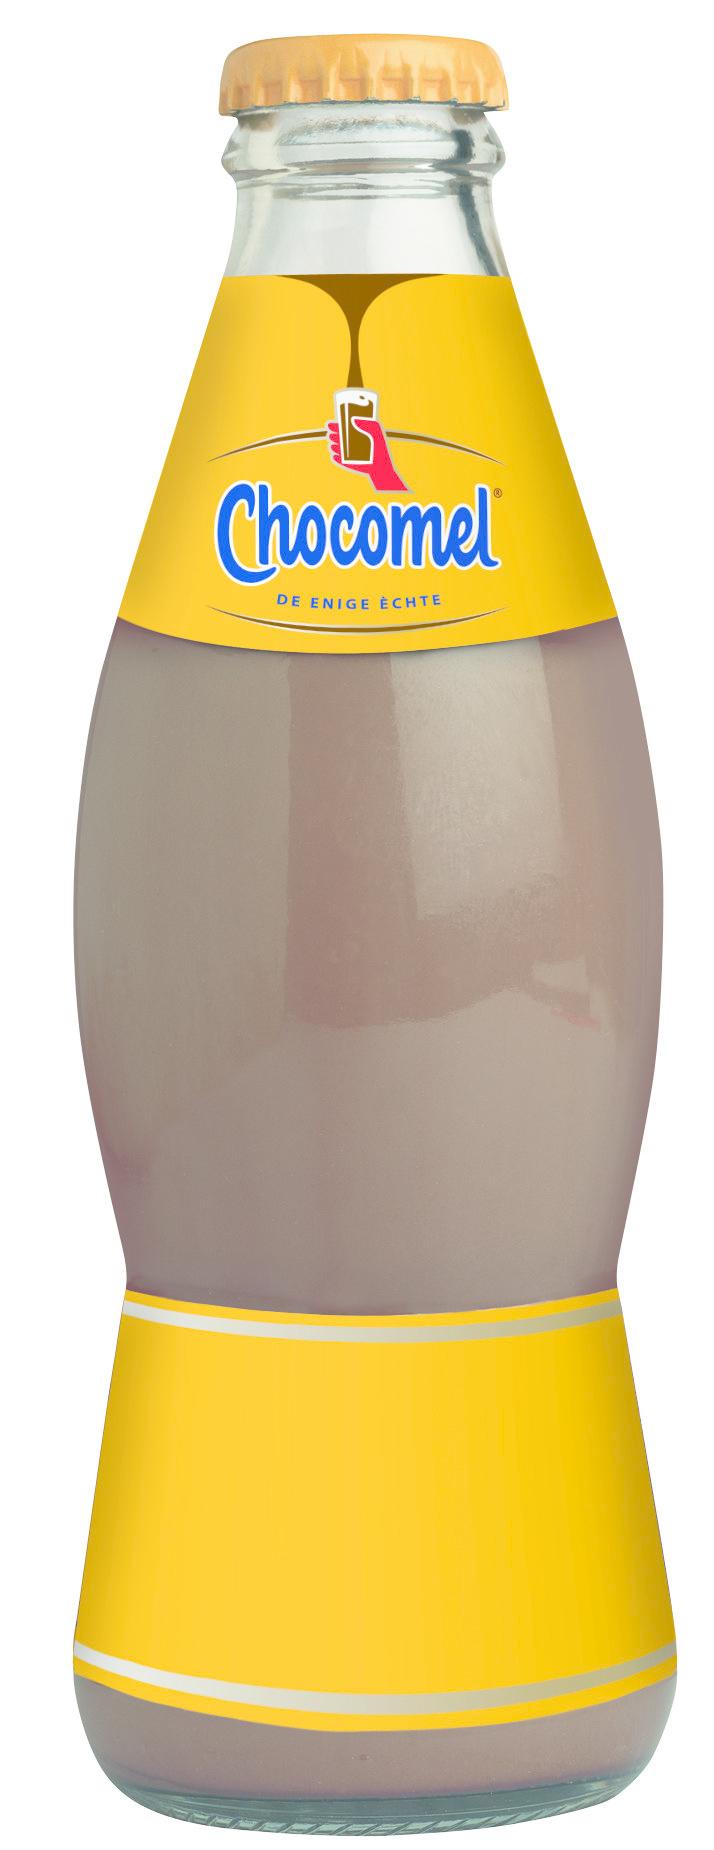 Chocomel Chocomel - Chocomel 20Cl Fles, 24 Flessen